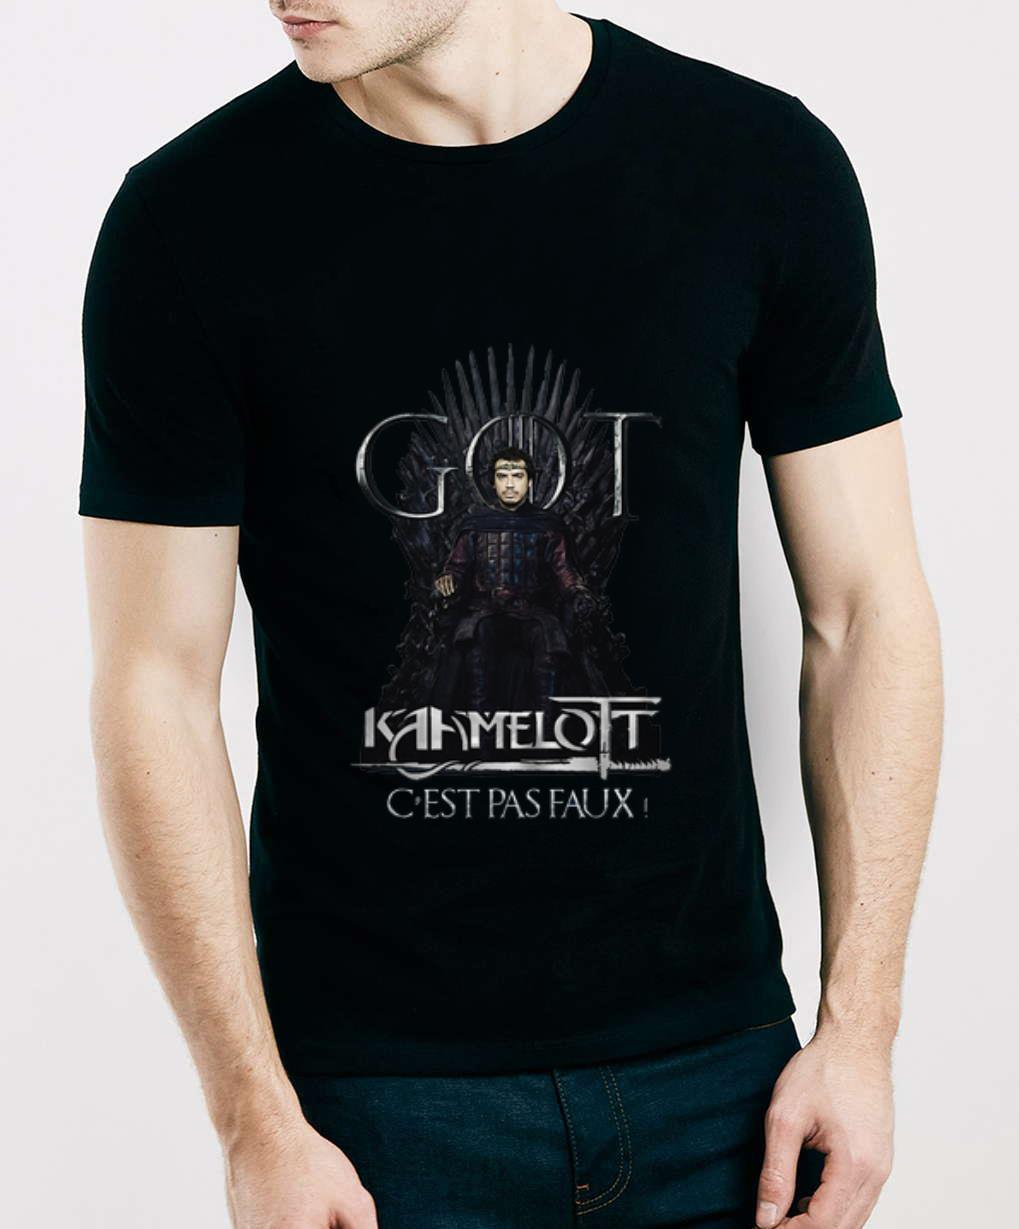 Great Iron Throne Got Kaamelott C Est Pas Faux Game Of Throne Shirt 3 1.jpg